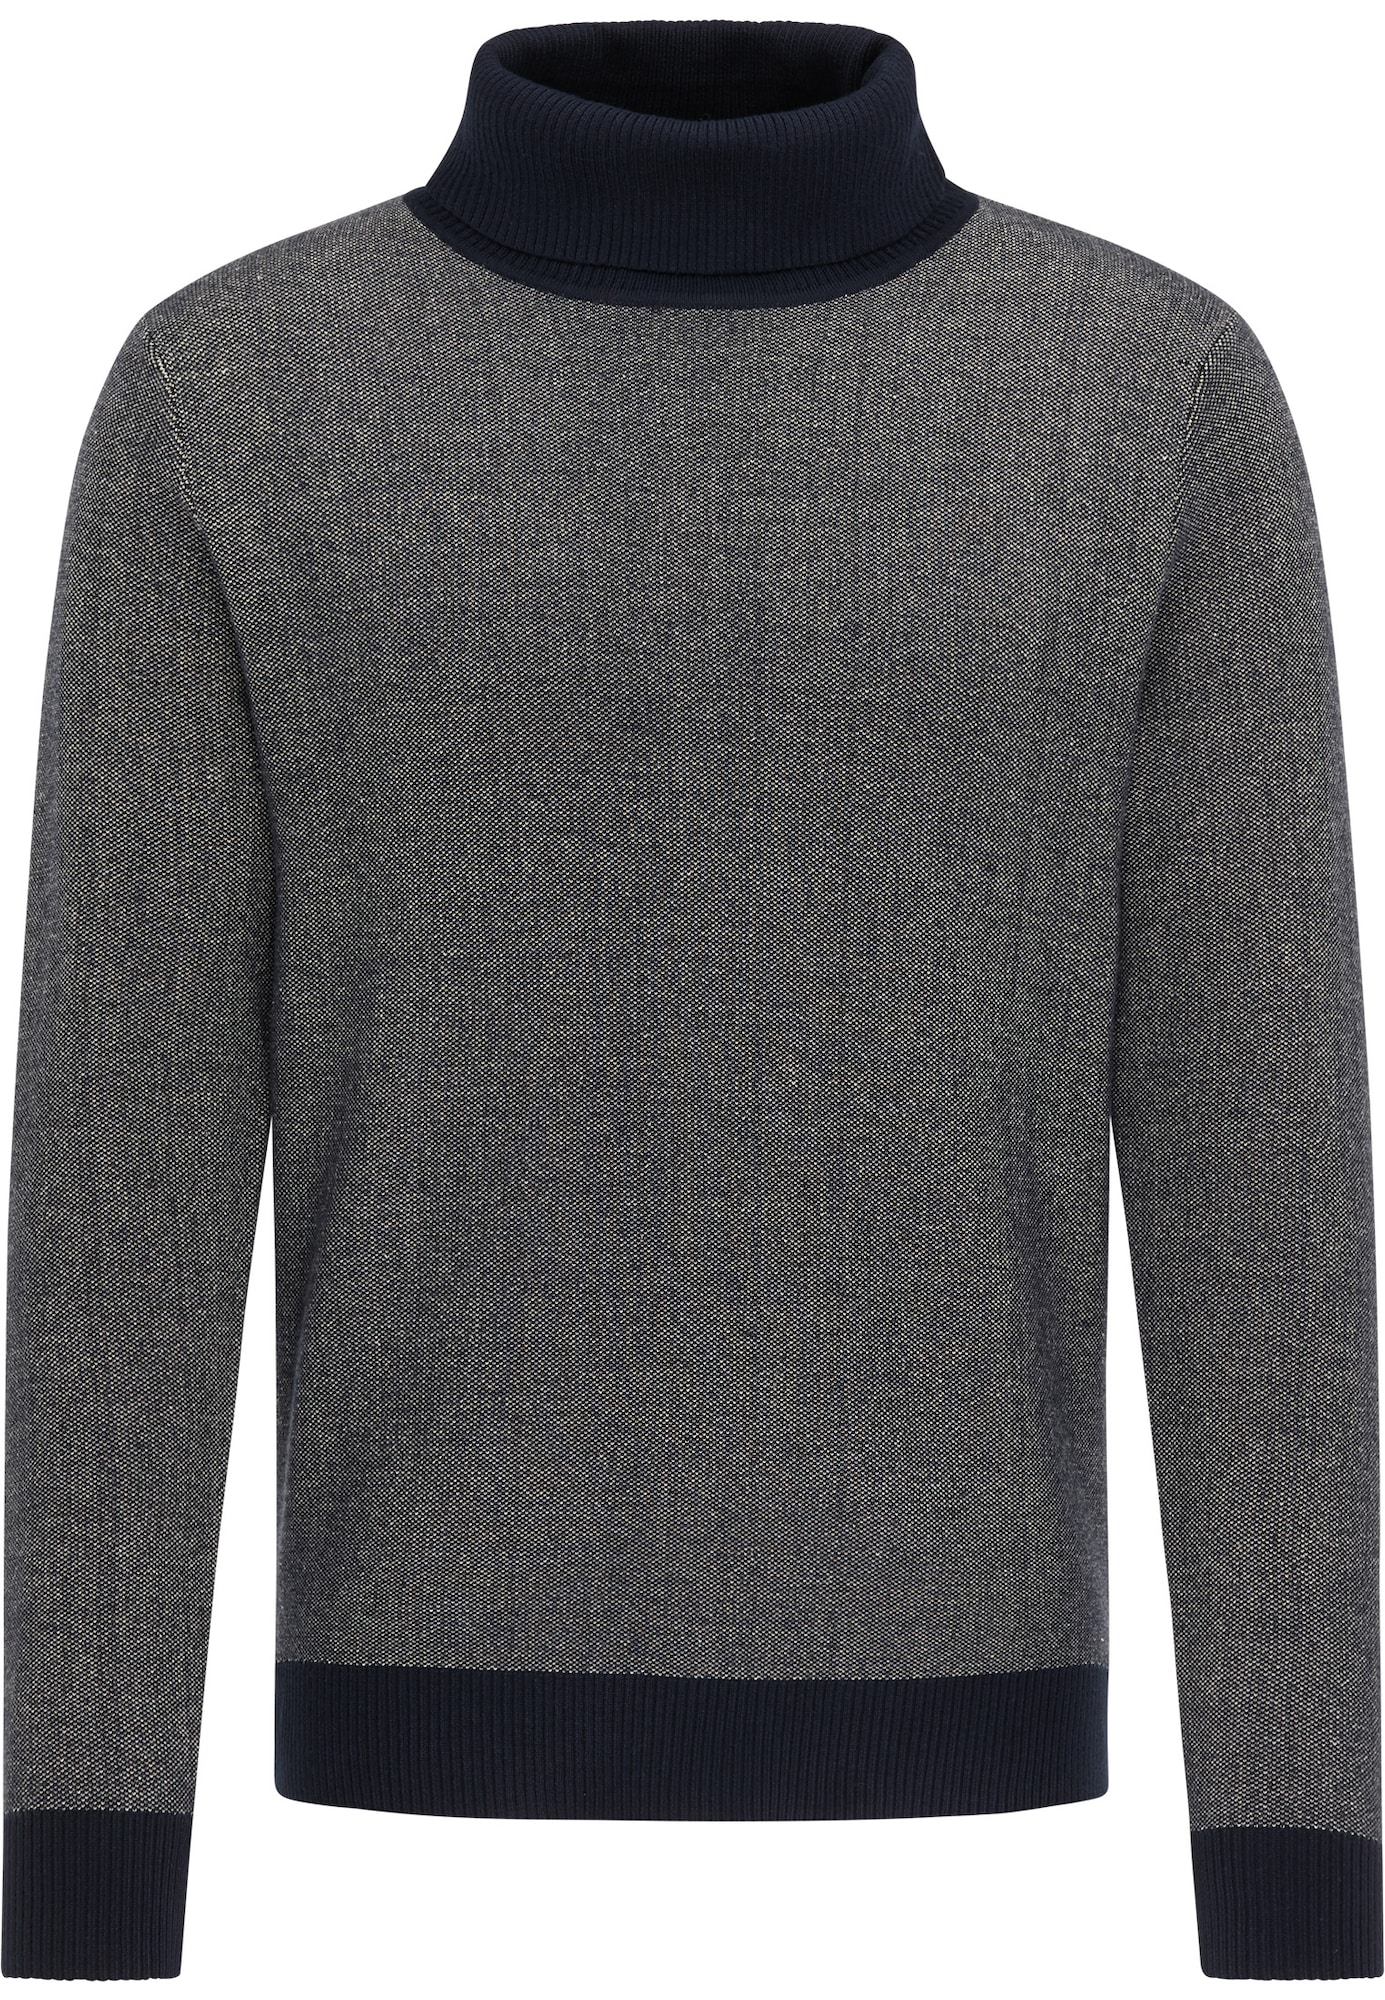 DreiMaster Vintage Megztinis margai pilka / tamsiai mėlyna